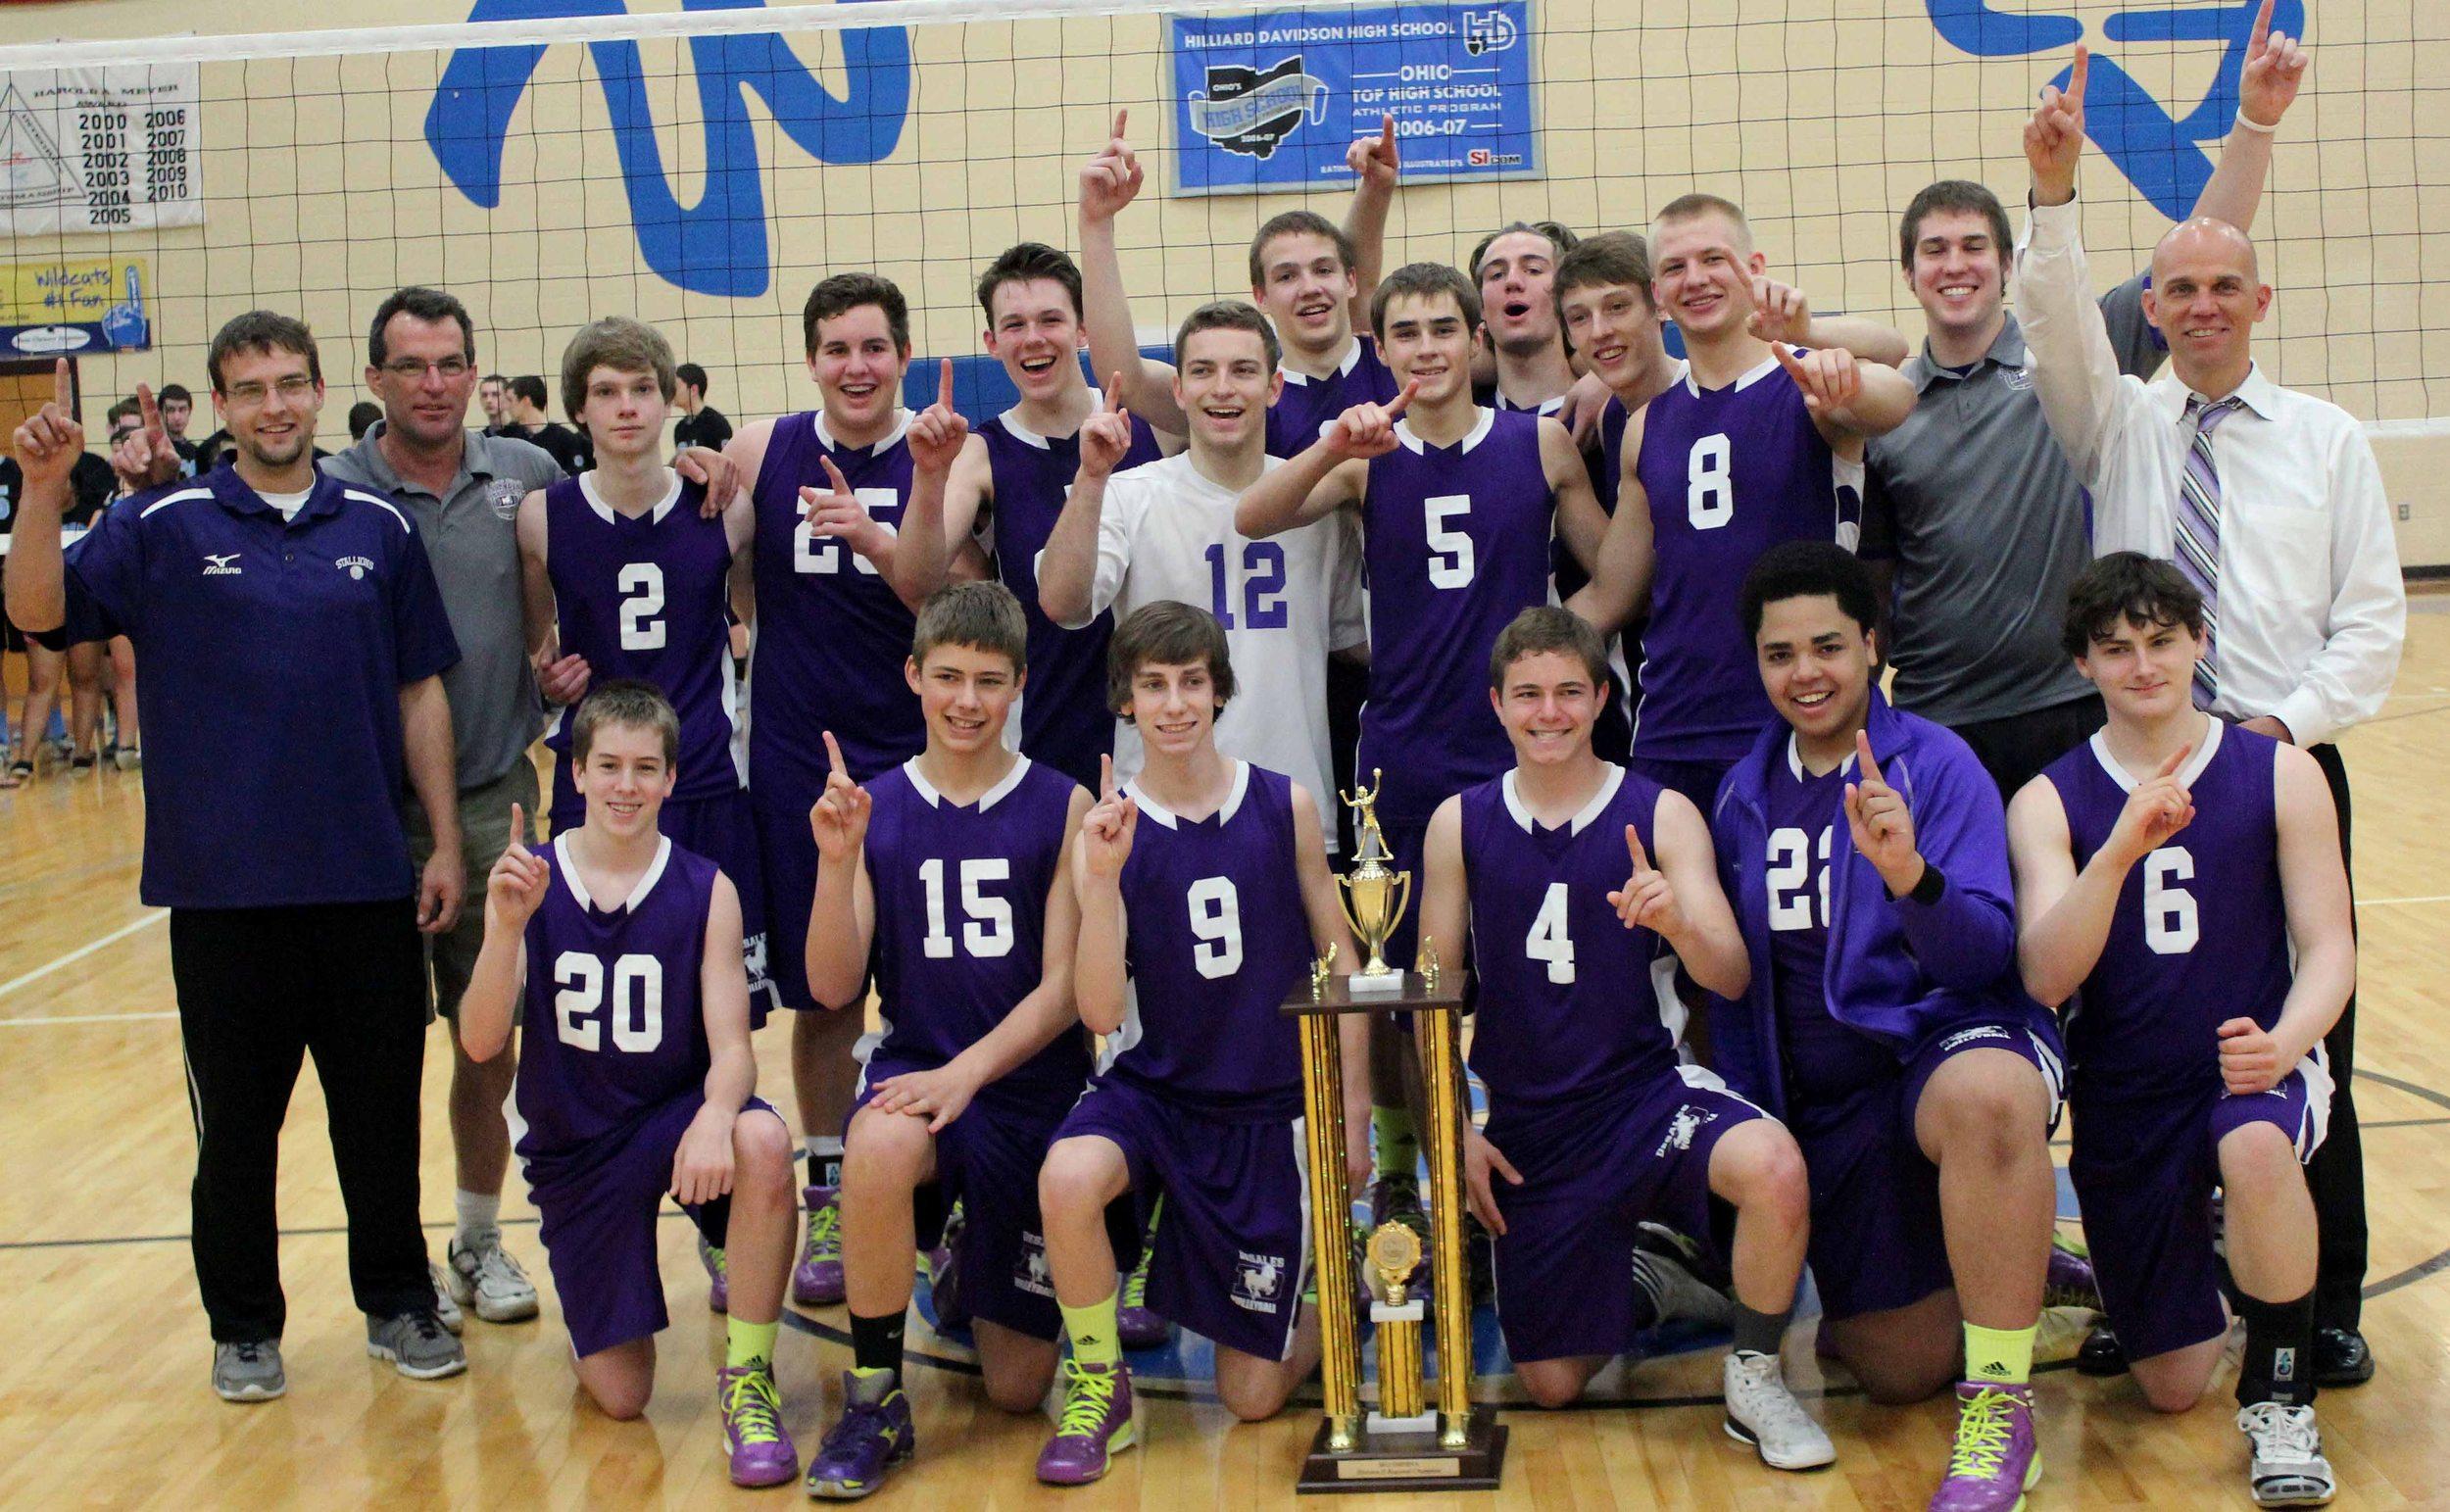 2013 Boys Volleyball